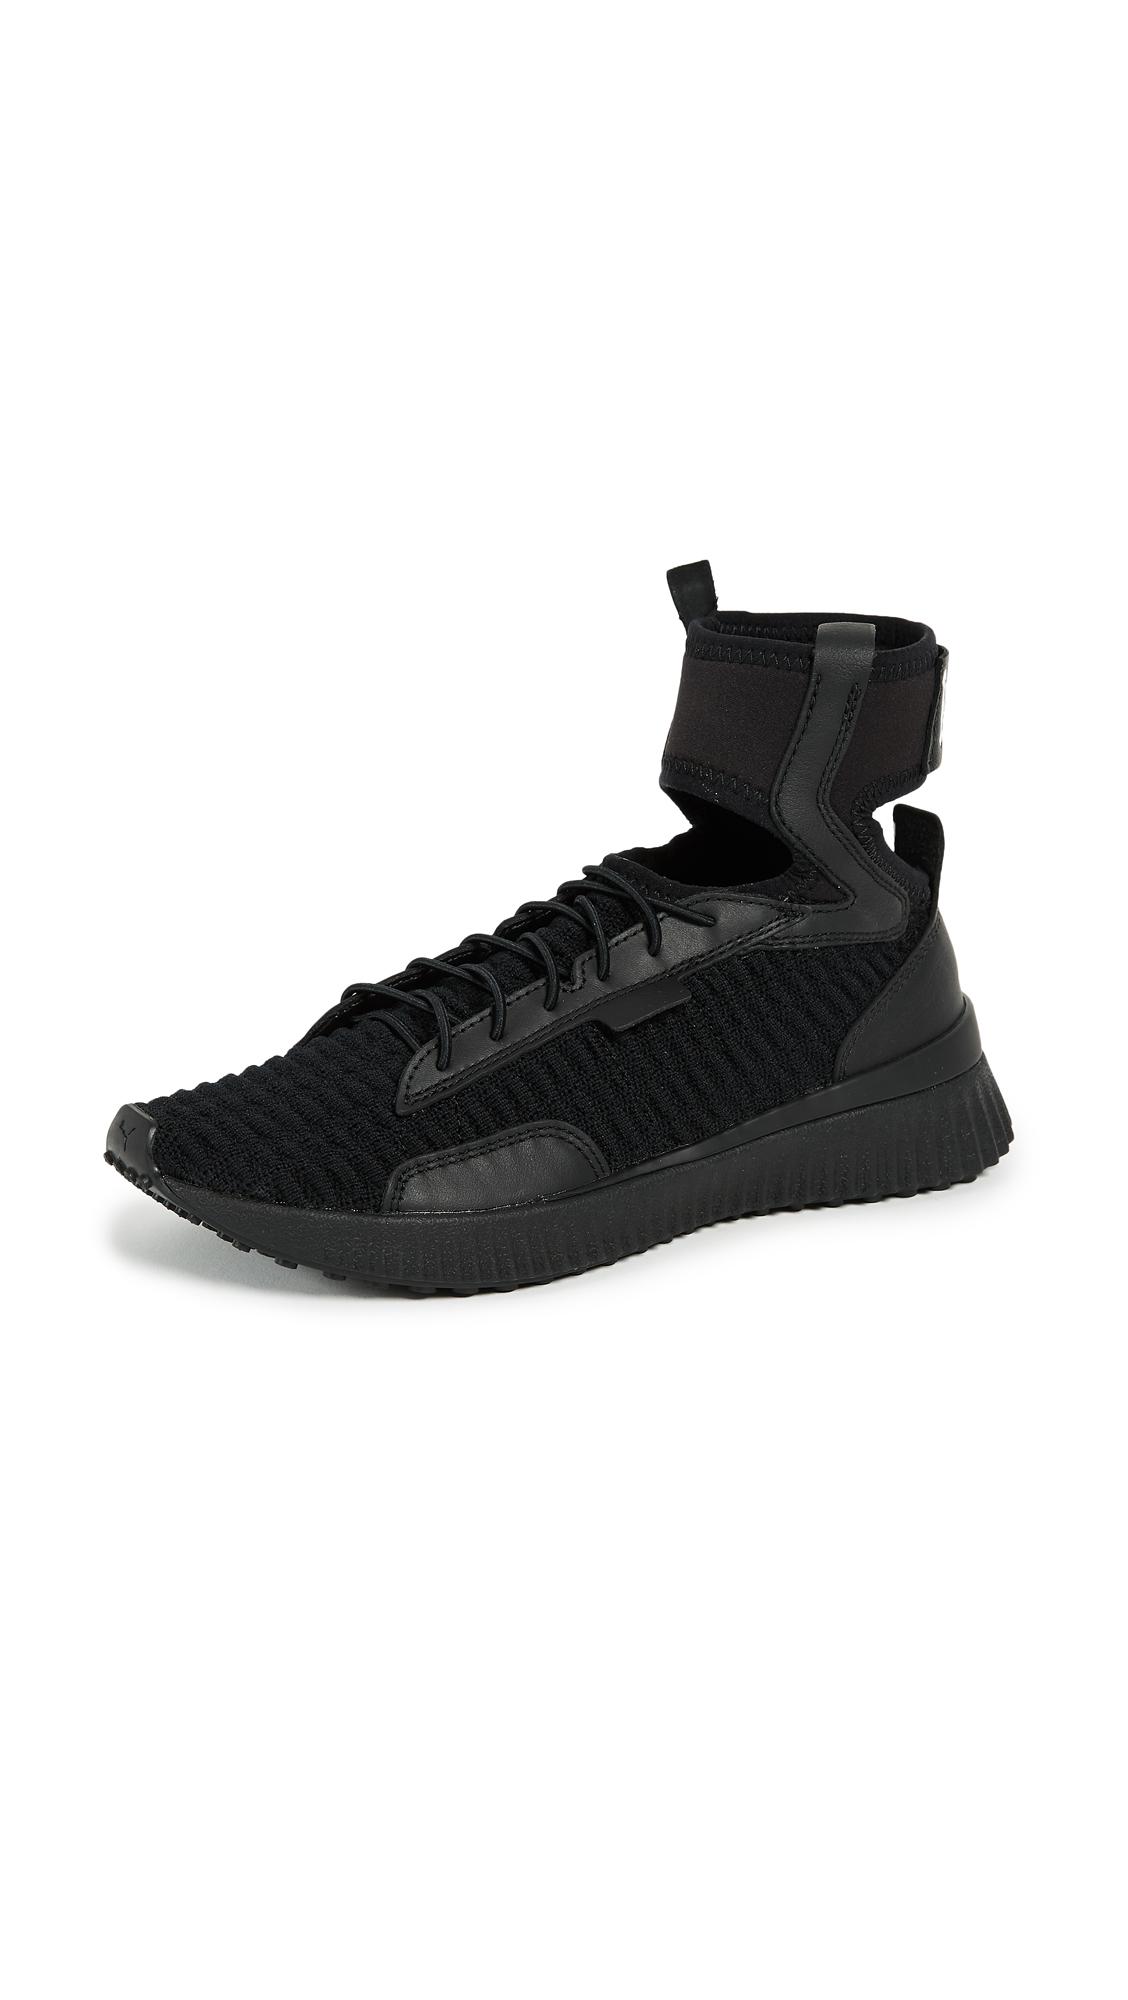 PUMA FENTY x PUMA Trainer Mid Sneakers - Puma Black/Puma White